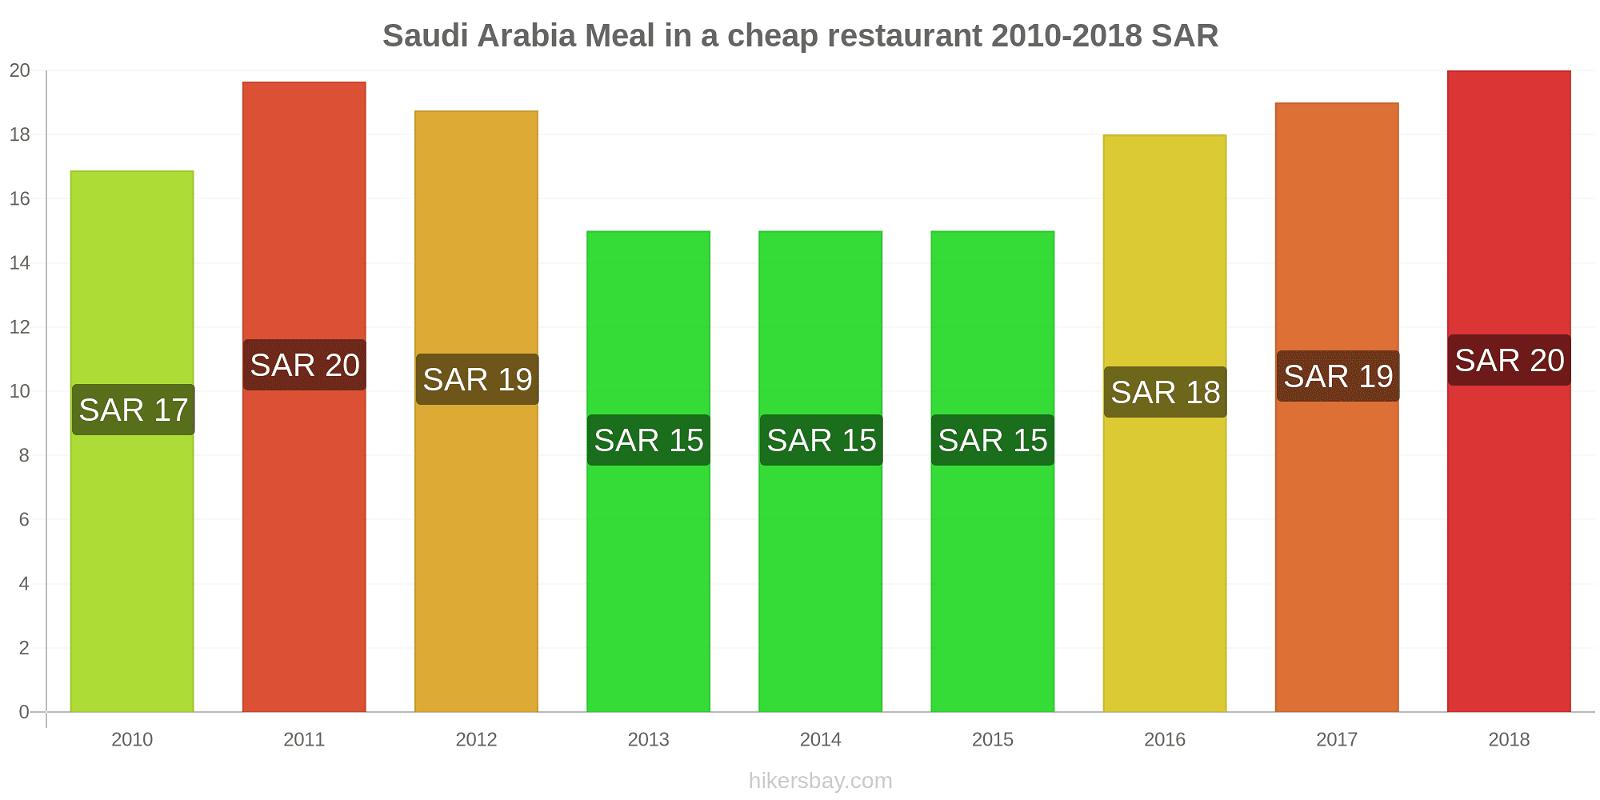 Saudi Arabia price changes Meal in a cheap restaurant hikersbay.com